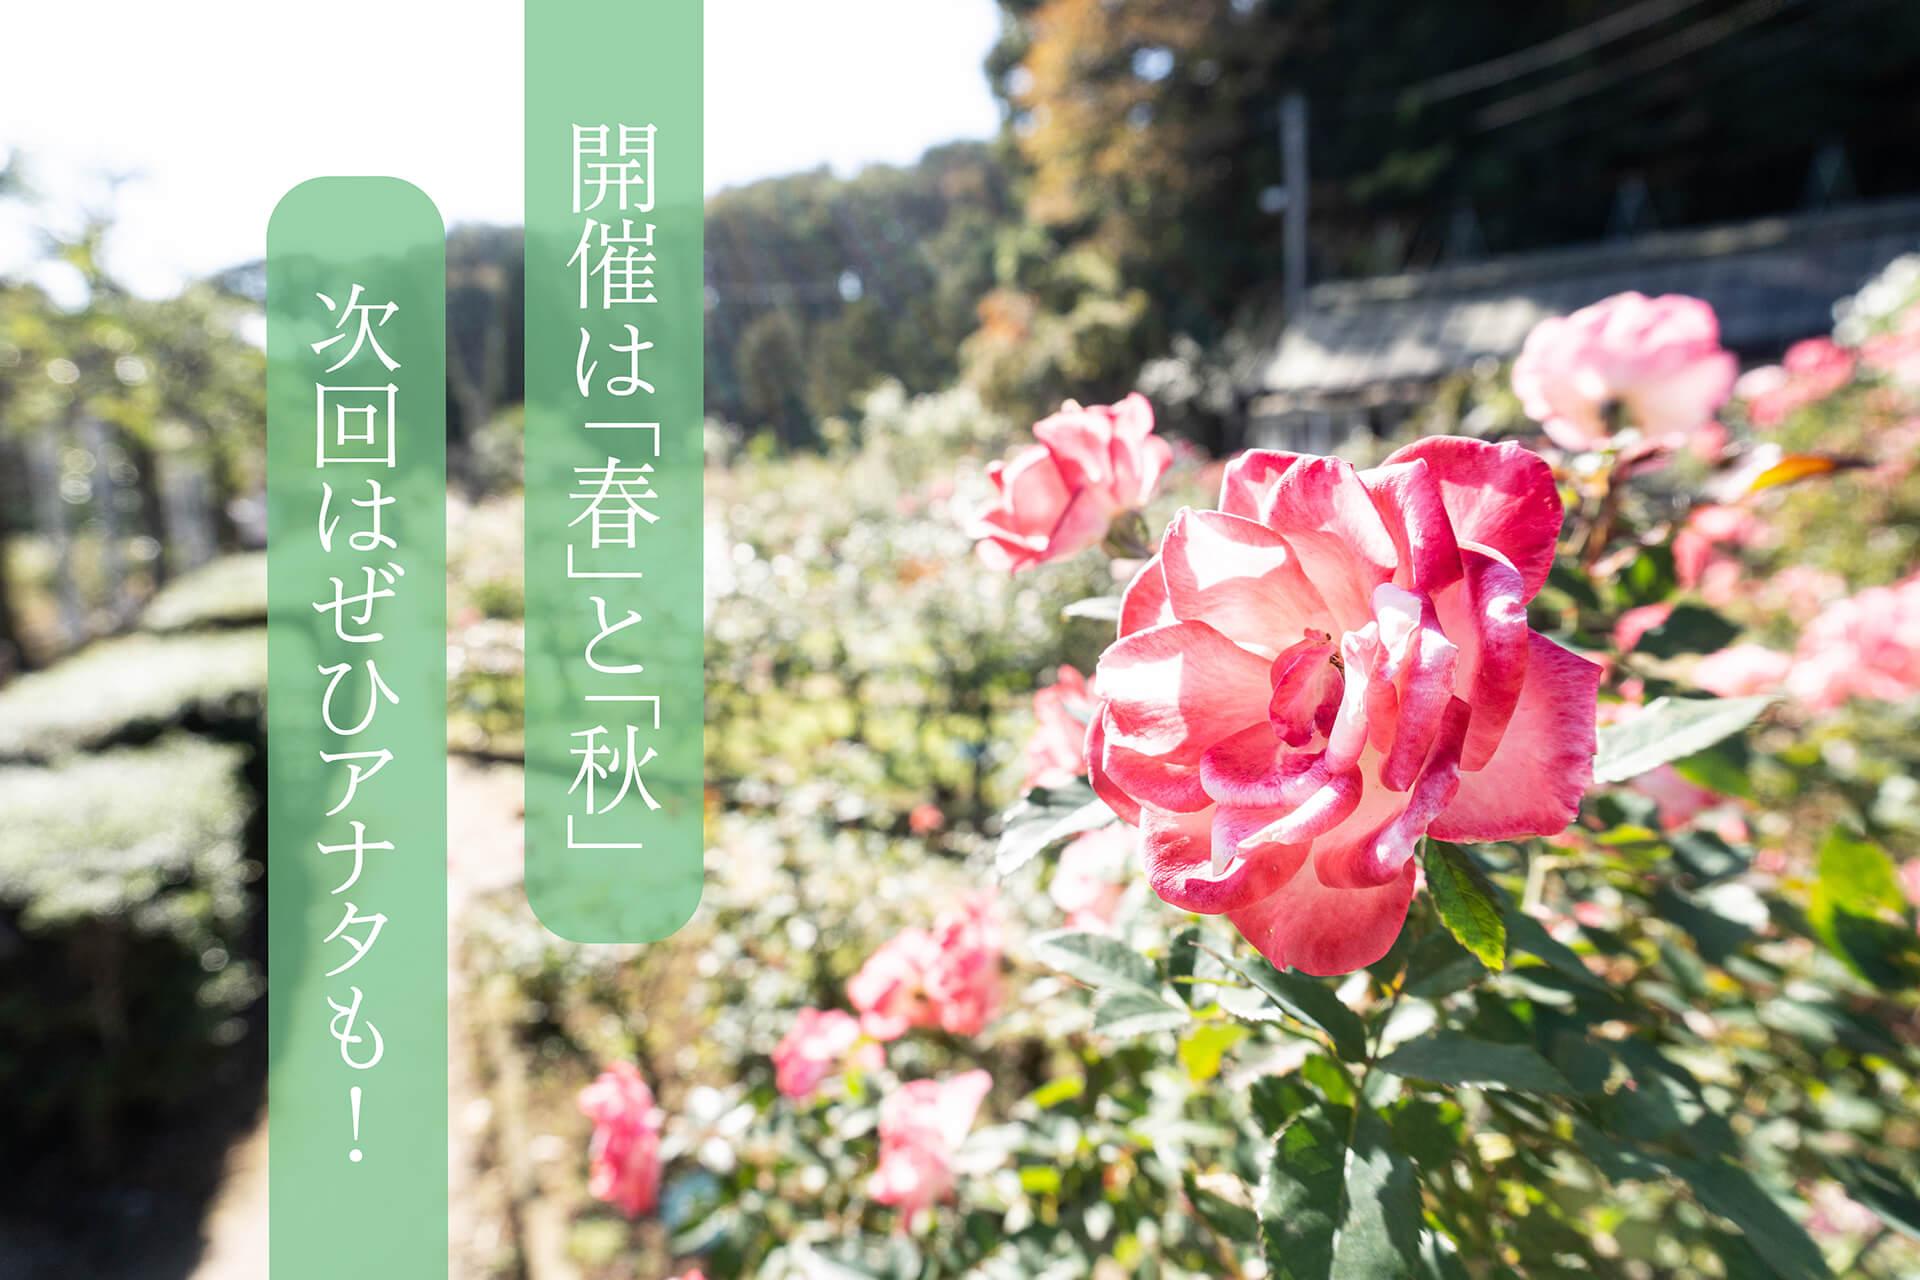 生田緑地バラ苑